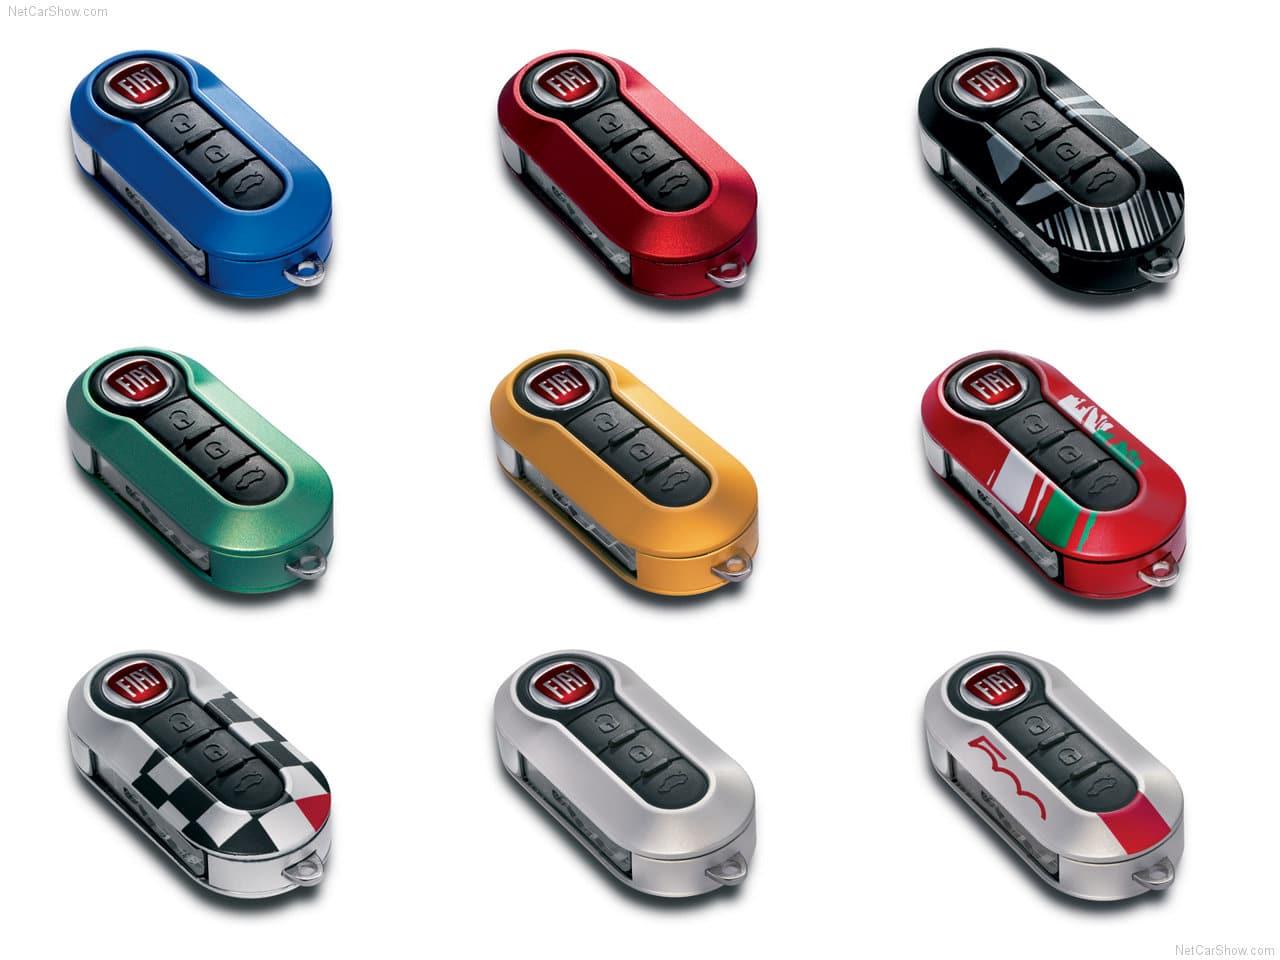 Fiat 500, fiat, 500, italian car, car, design, style, car, classic car, retro car, retro styling, motoring, automotive, motoring, ebay motors, autotrader, not2grand